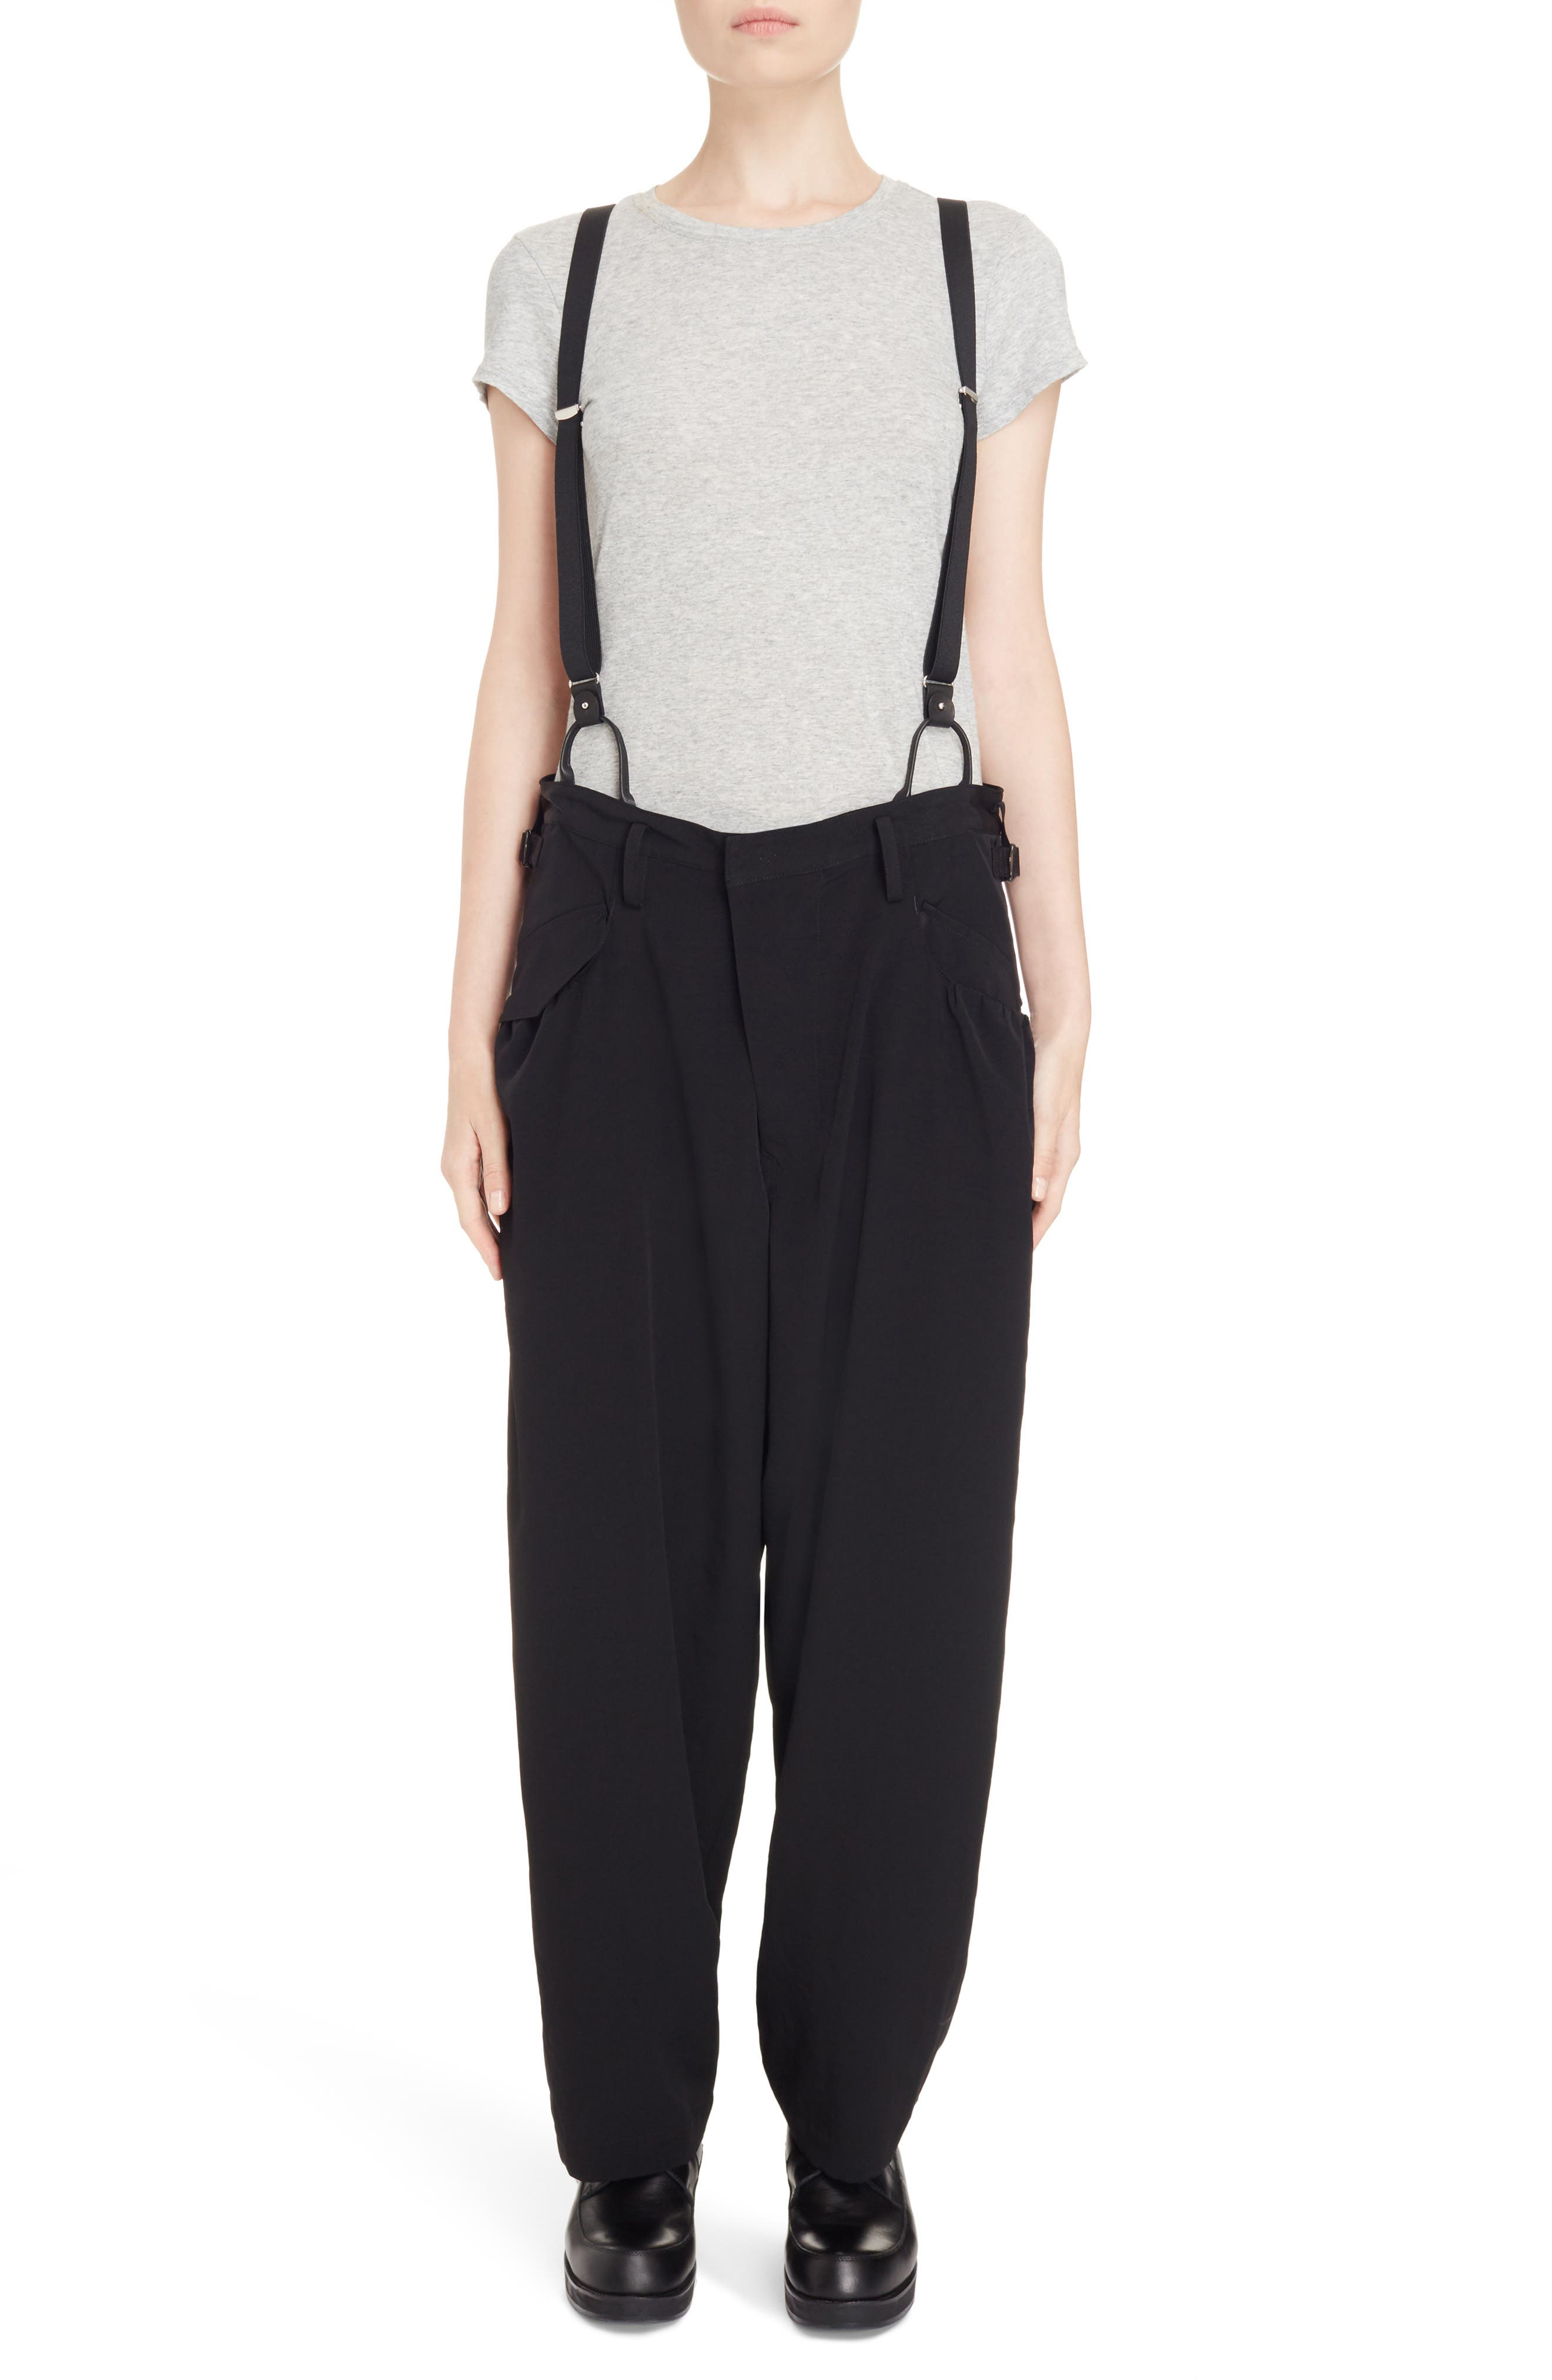 Y's by Yohji Yamamoto Pants with Suspenders